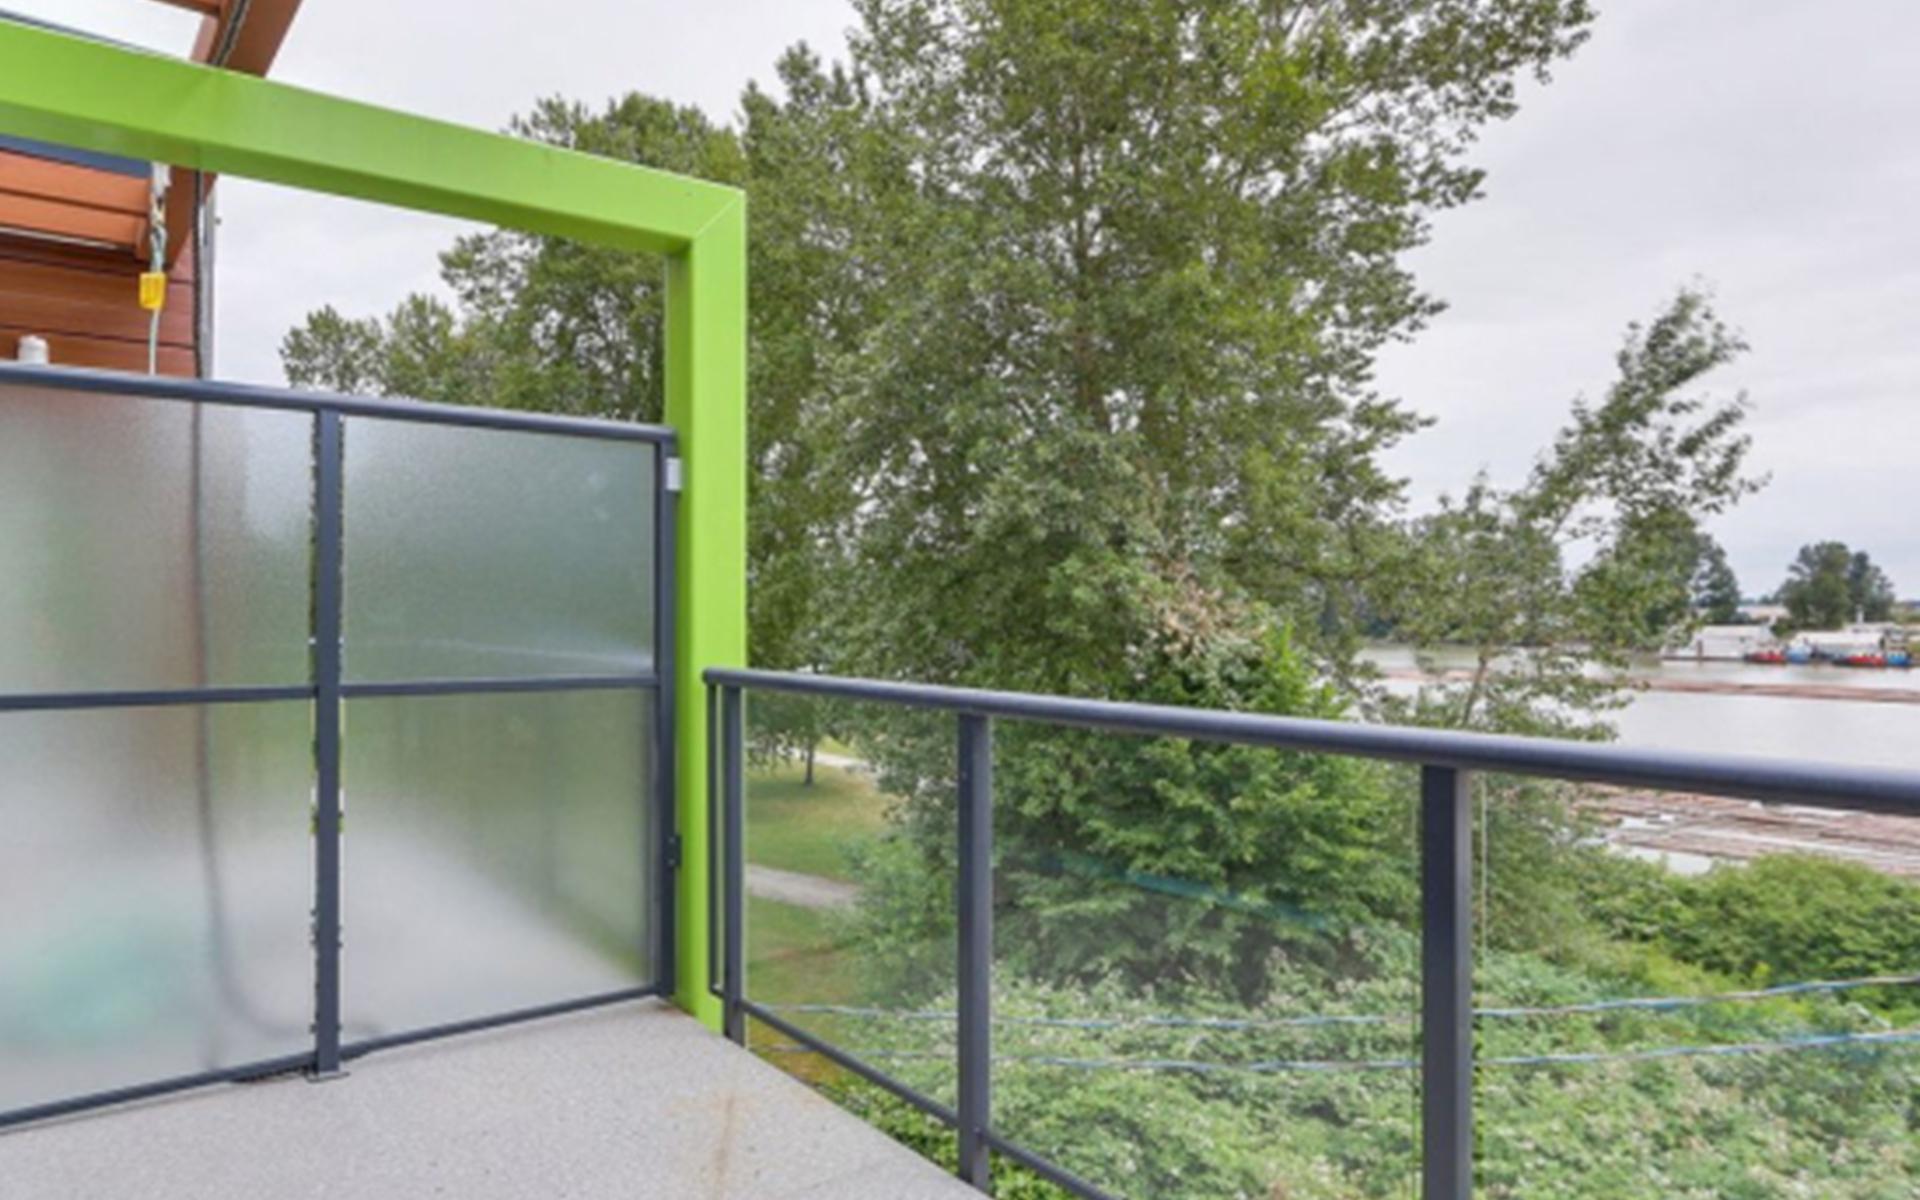 https://fraserviewhousingcoop.ca/wp-content/uploads/2020/07/cd3.jpg